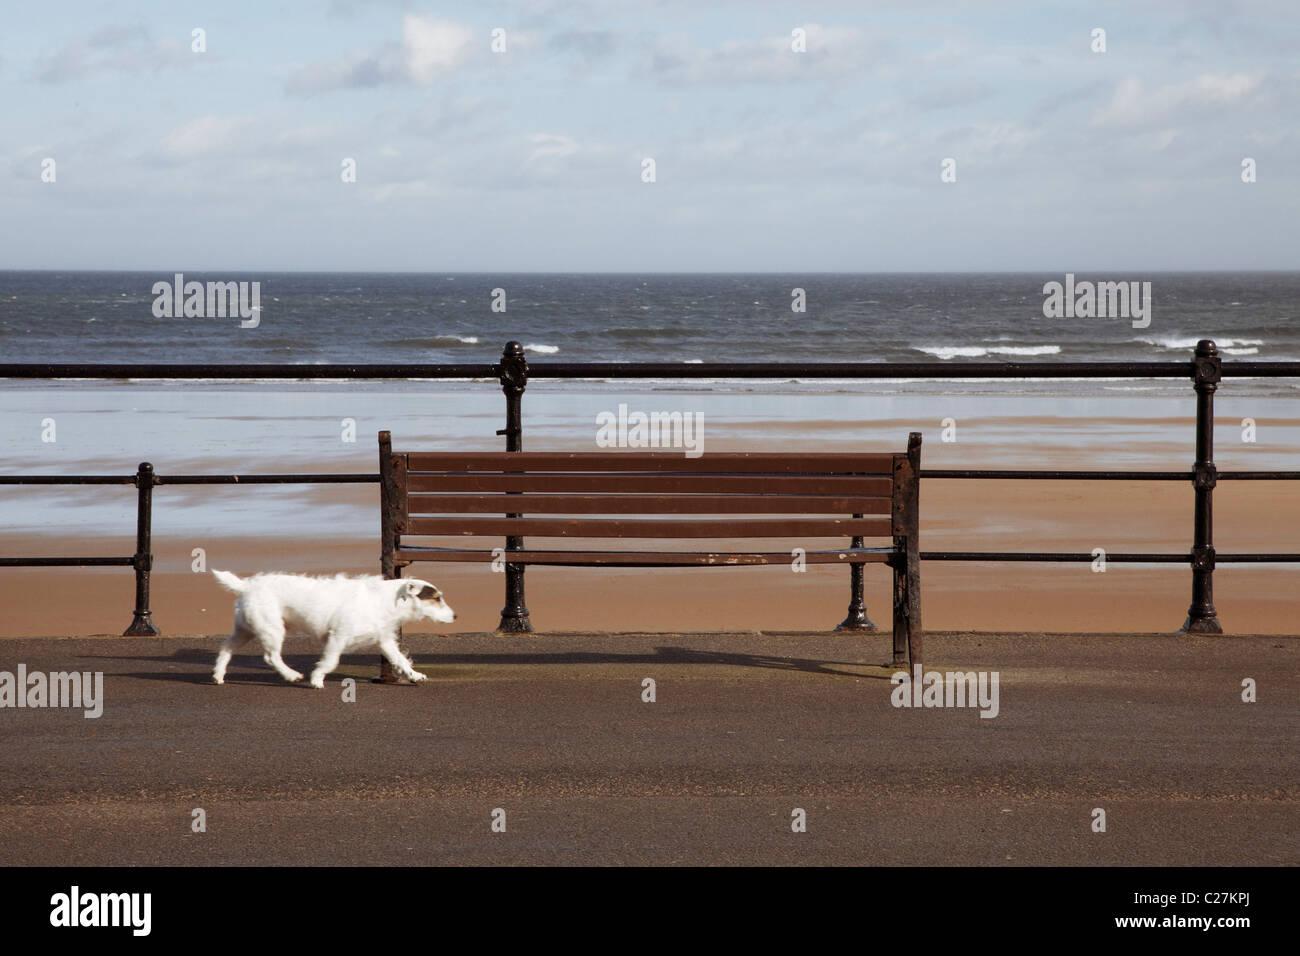 Remarkable Small Dog Walking Fast Past Seaside Bench Stock Photo Frankydiablos Diy Chair Ideas Frankydiabloscom